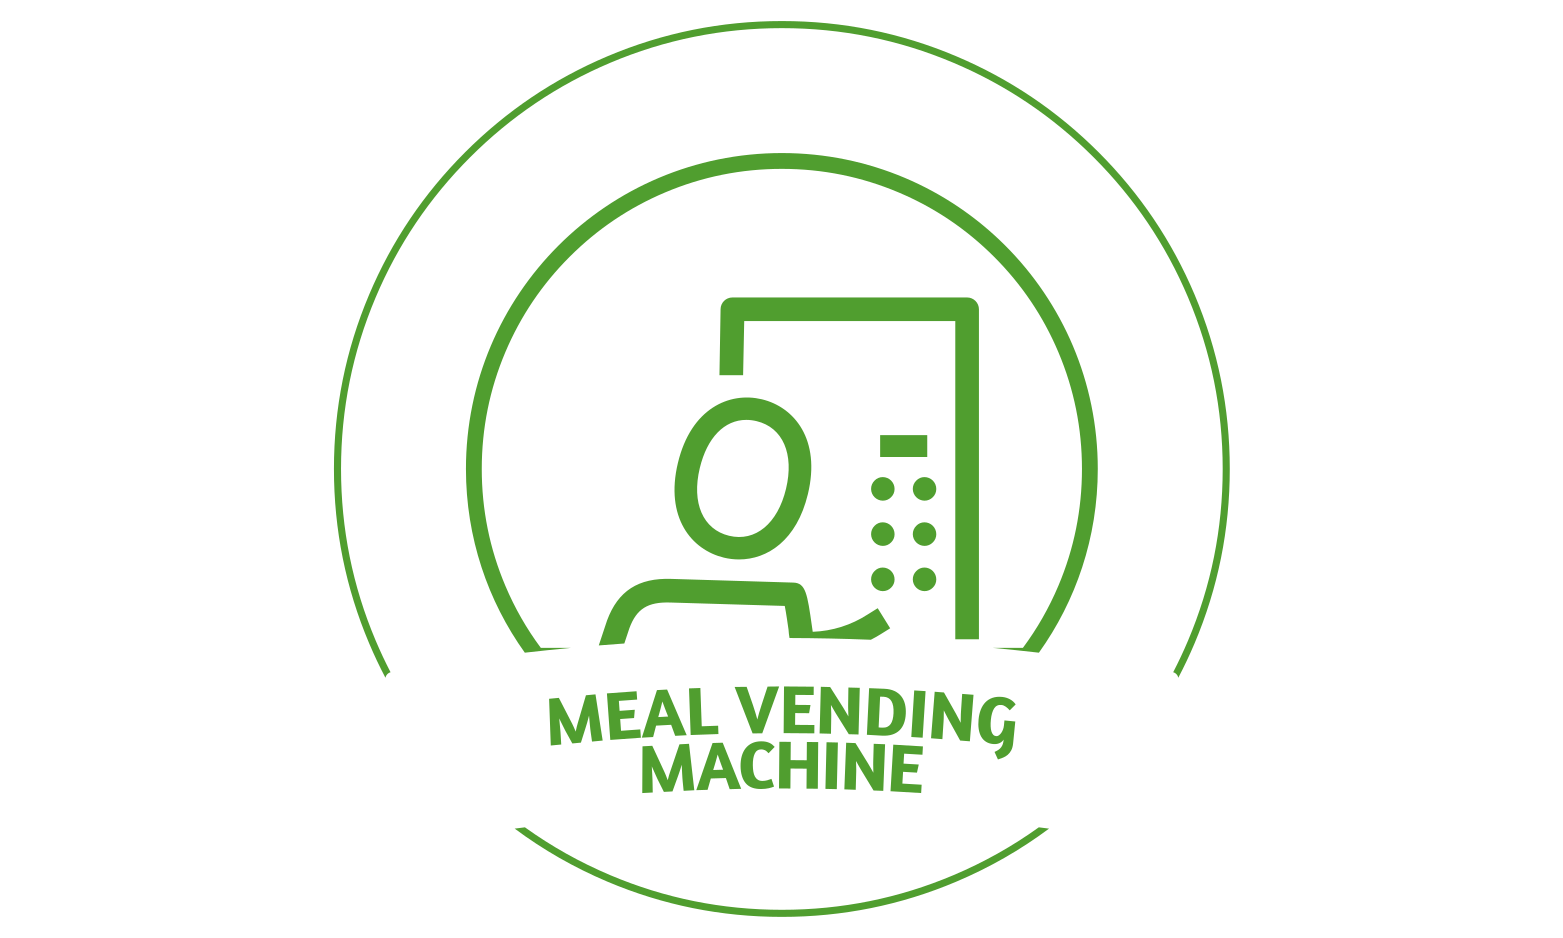 Meal Vending